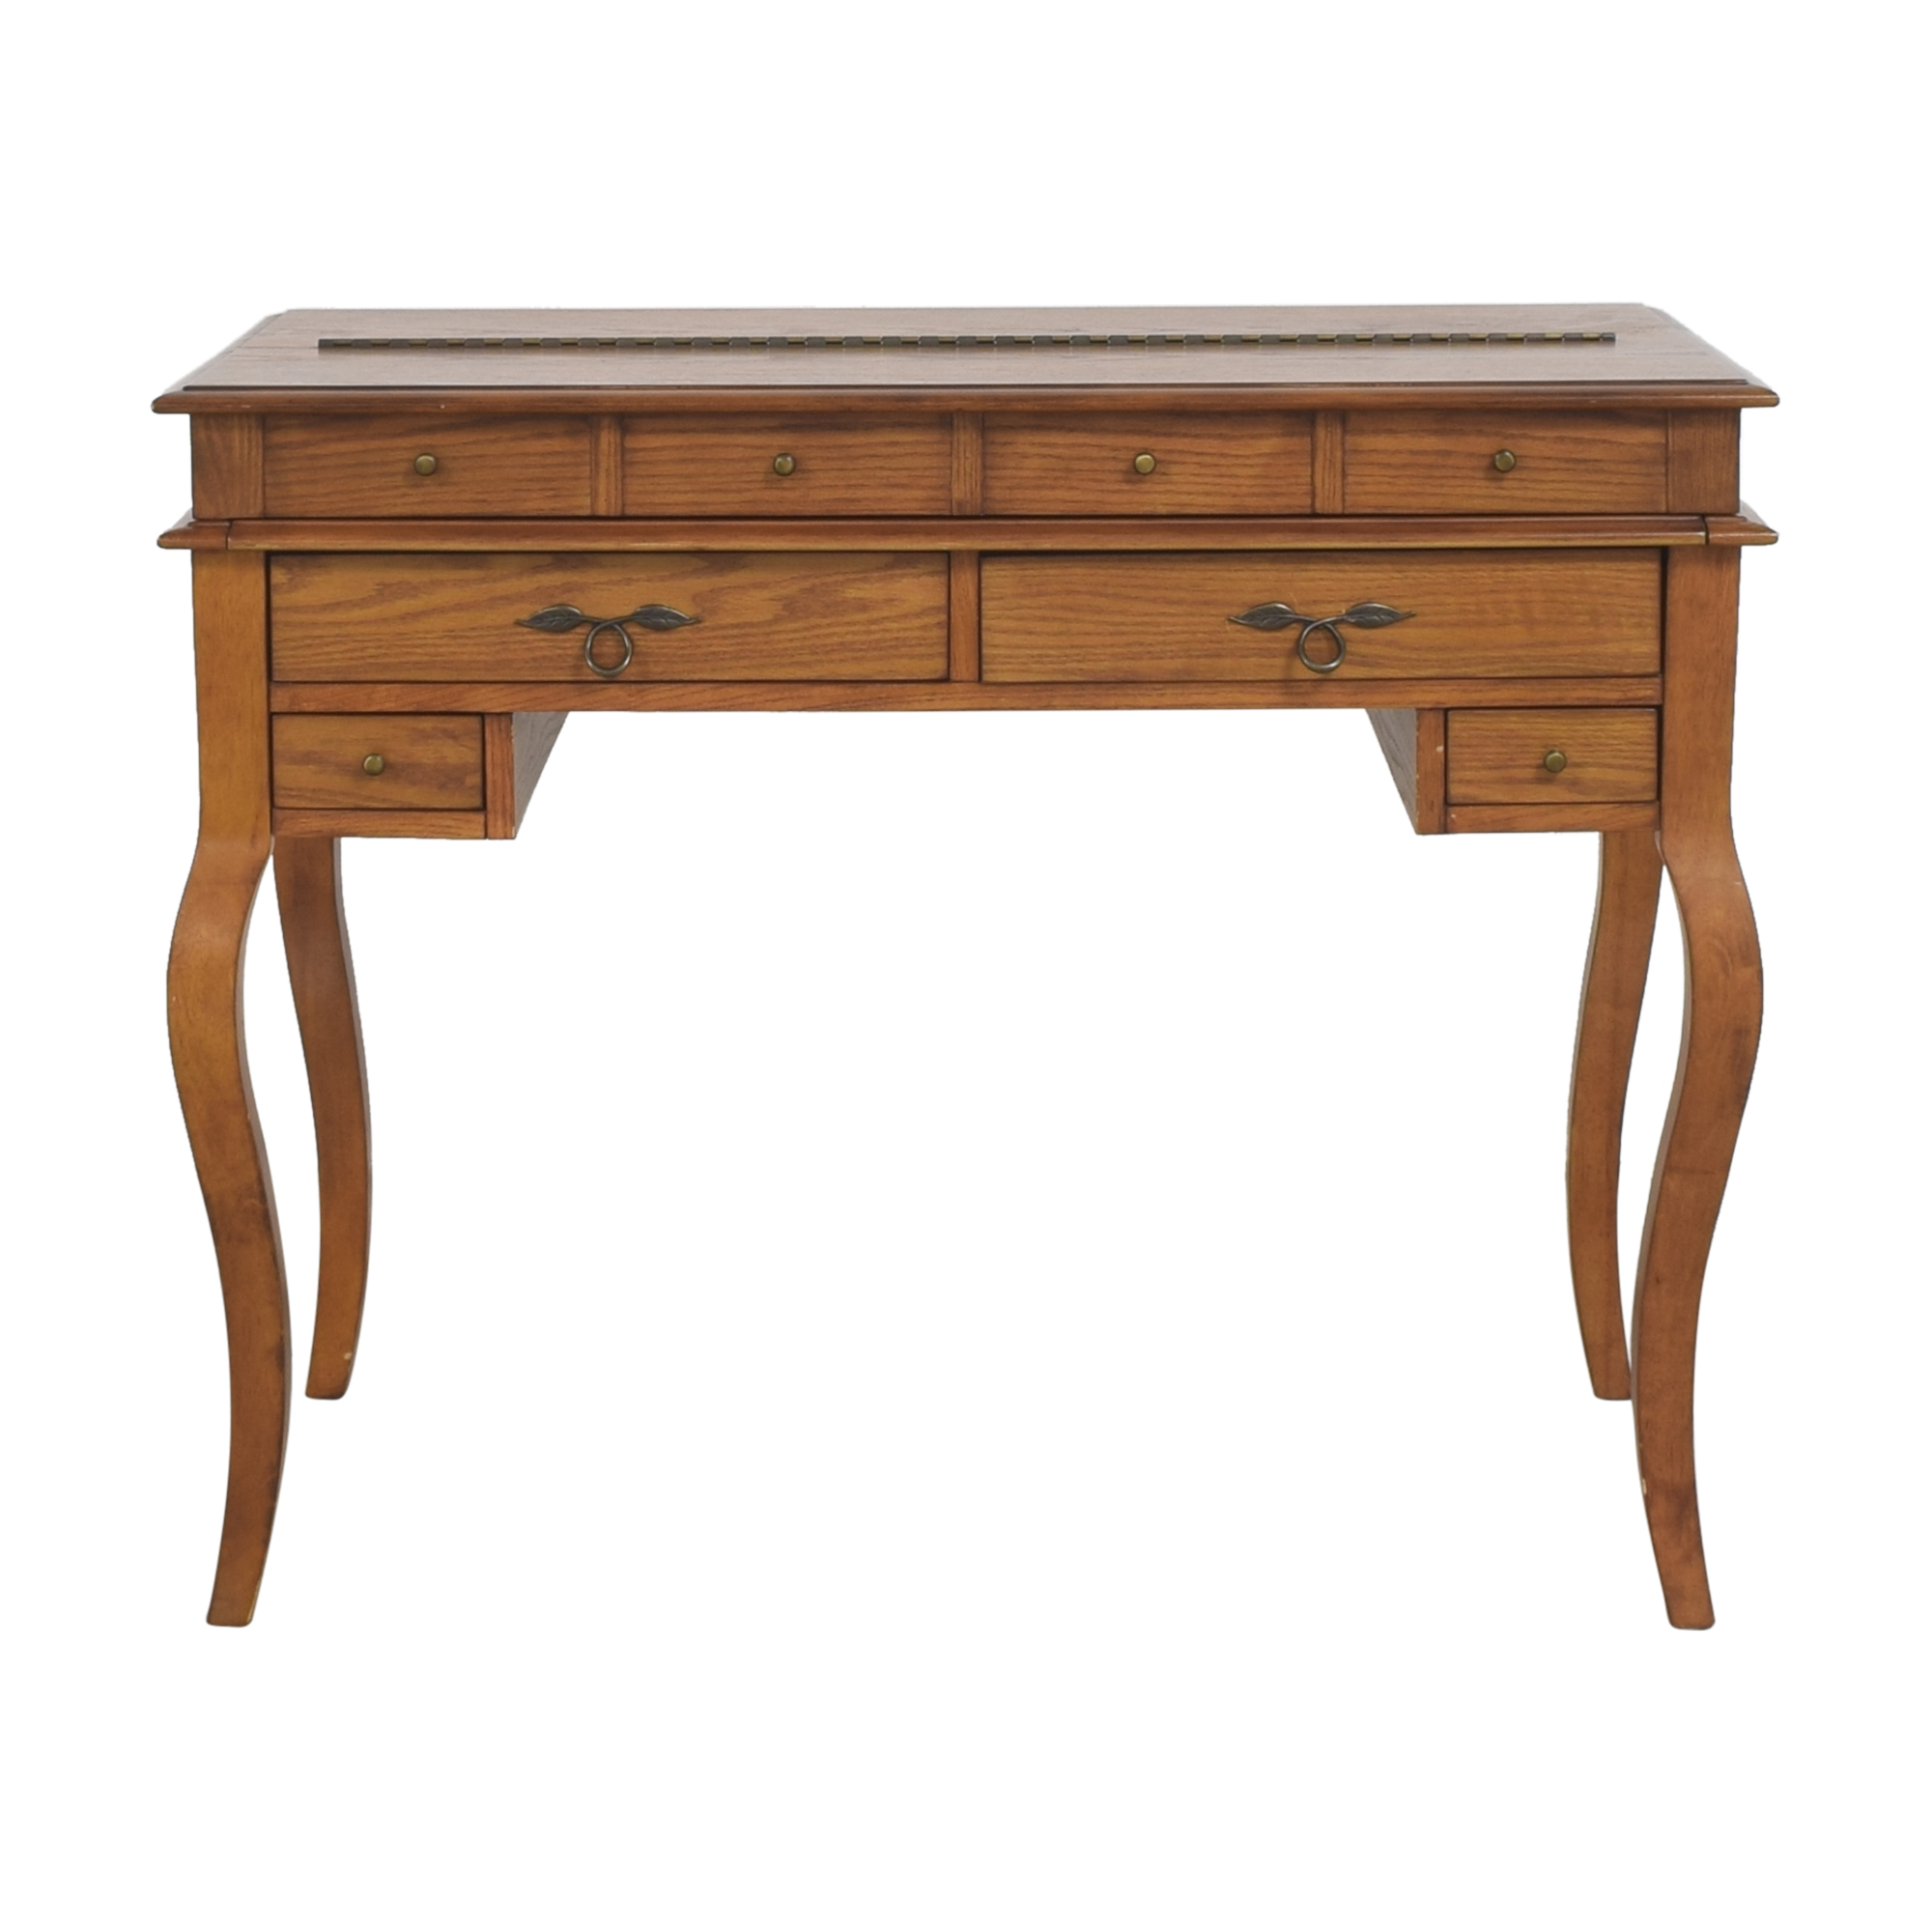 Lillian August Lillian August Flip Top Writing Desk for sale